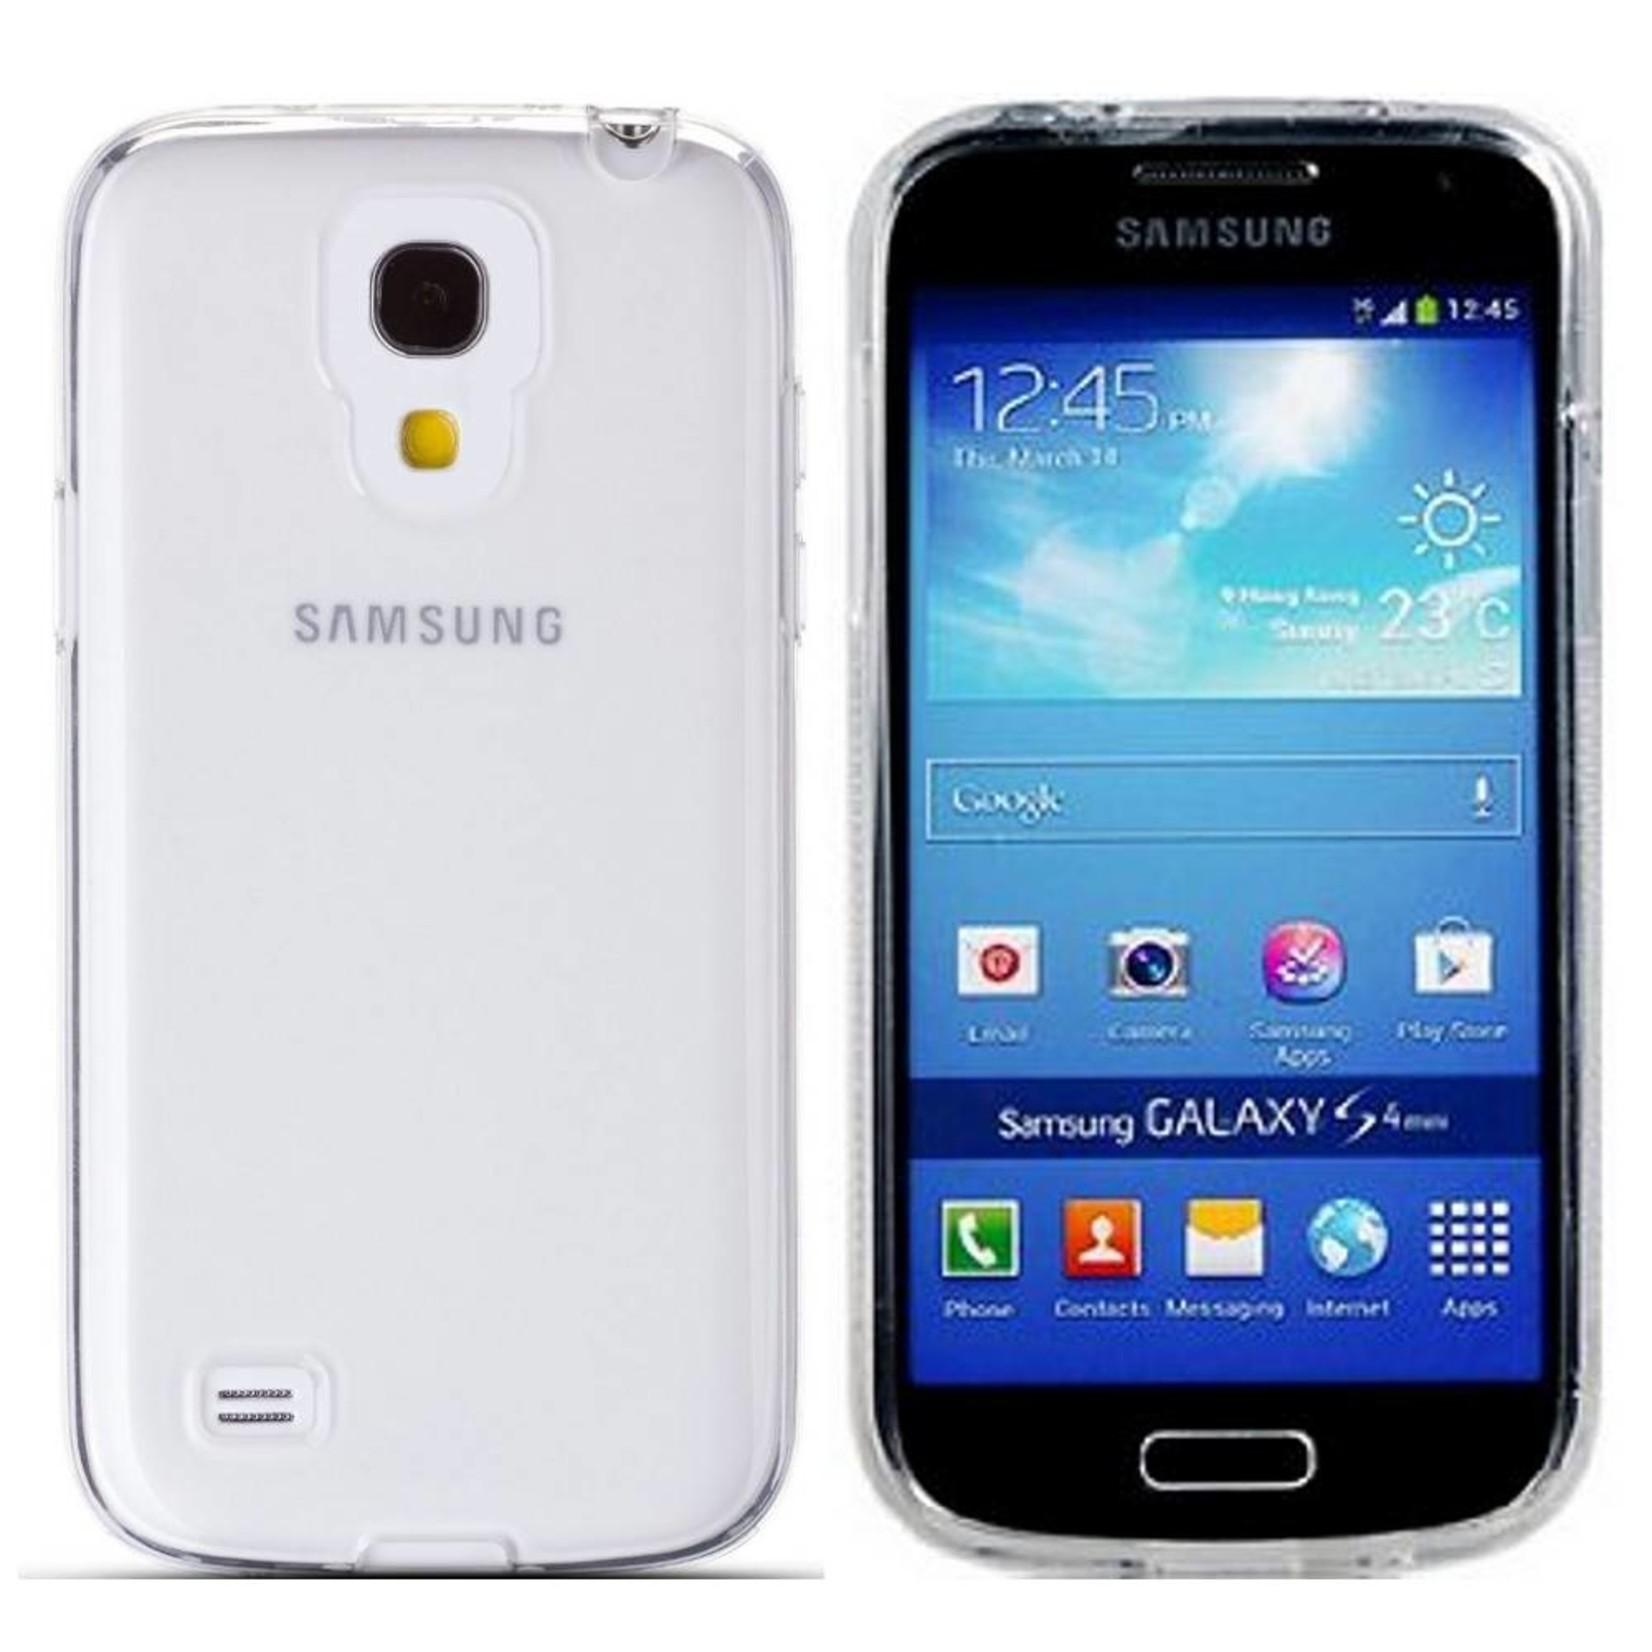 Colorfone Hoesje CoolSkin3T voor Samsung Galaxy i9190 S4 Mini Transp. Wit